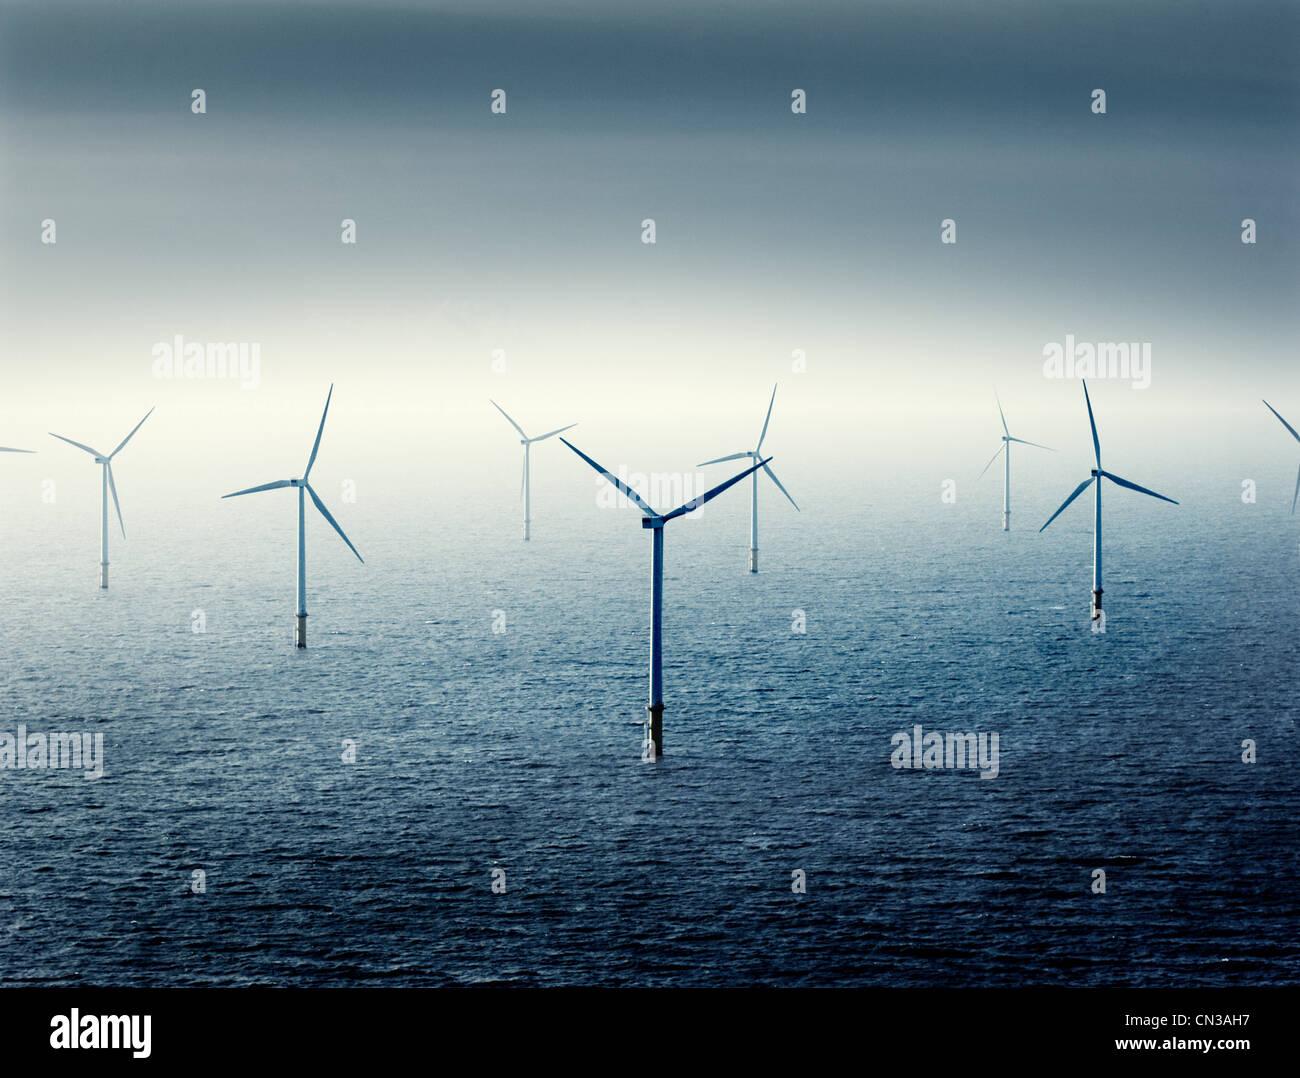 Windparks auf hoher See Stockbild